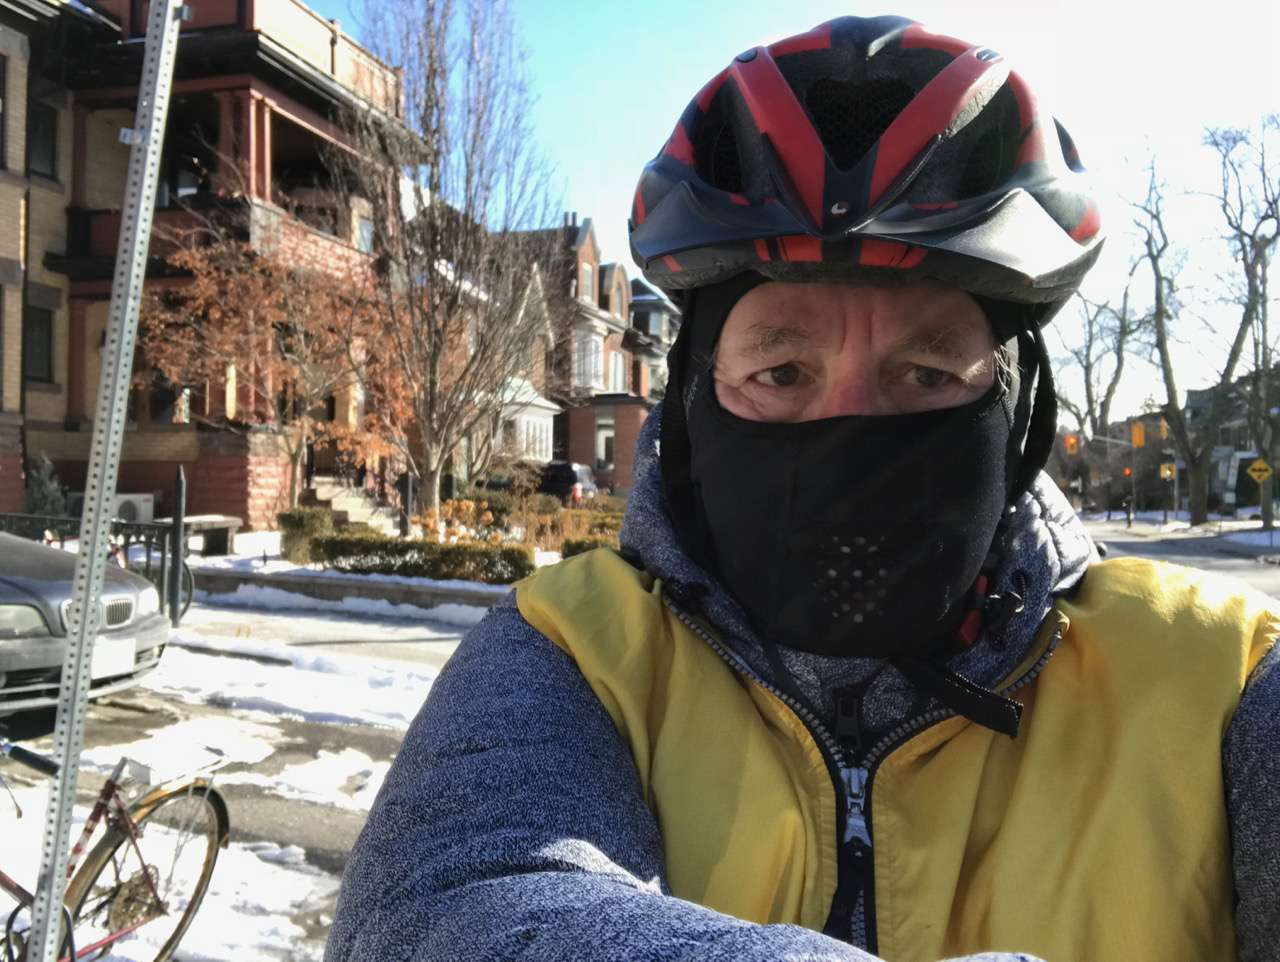 Lloyd Alter riding in winter